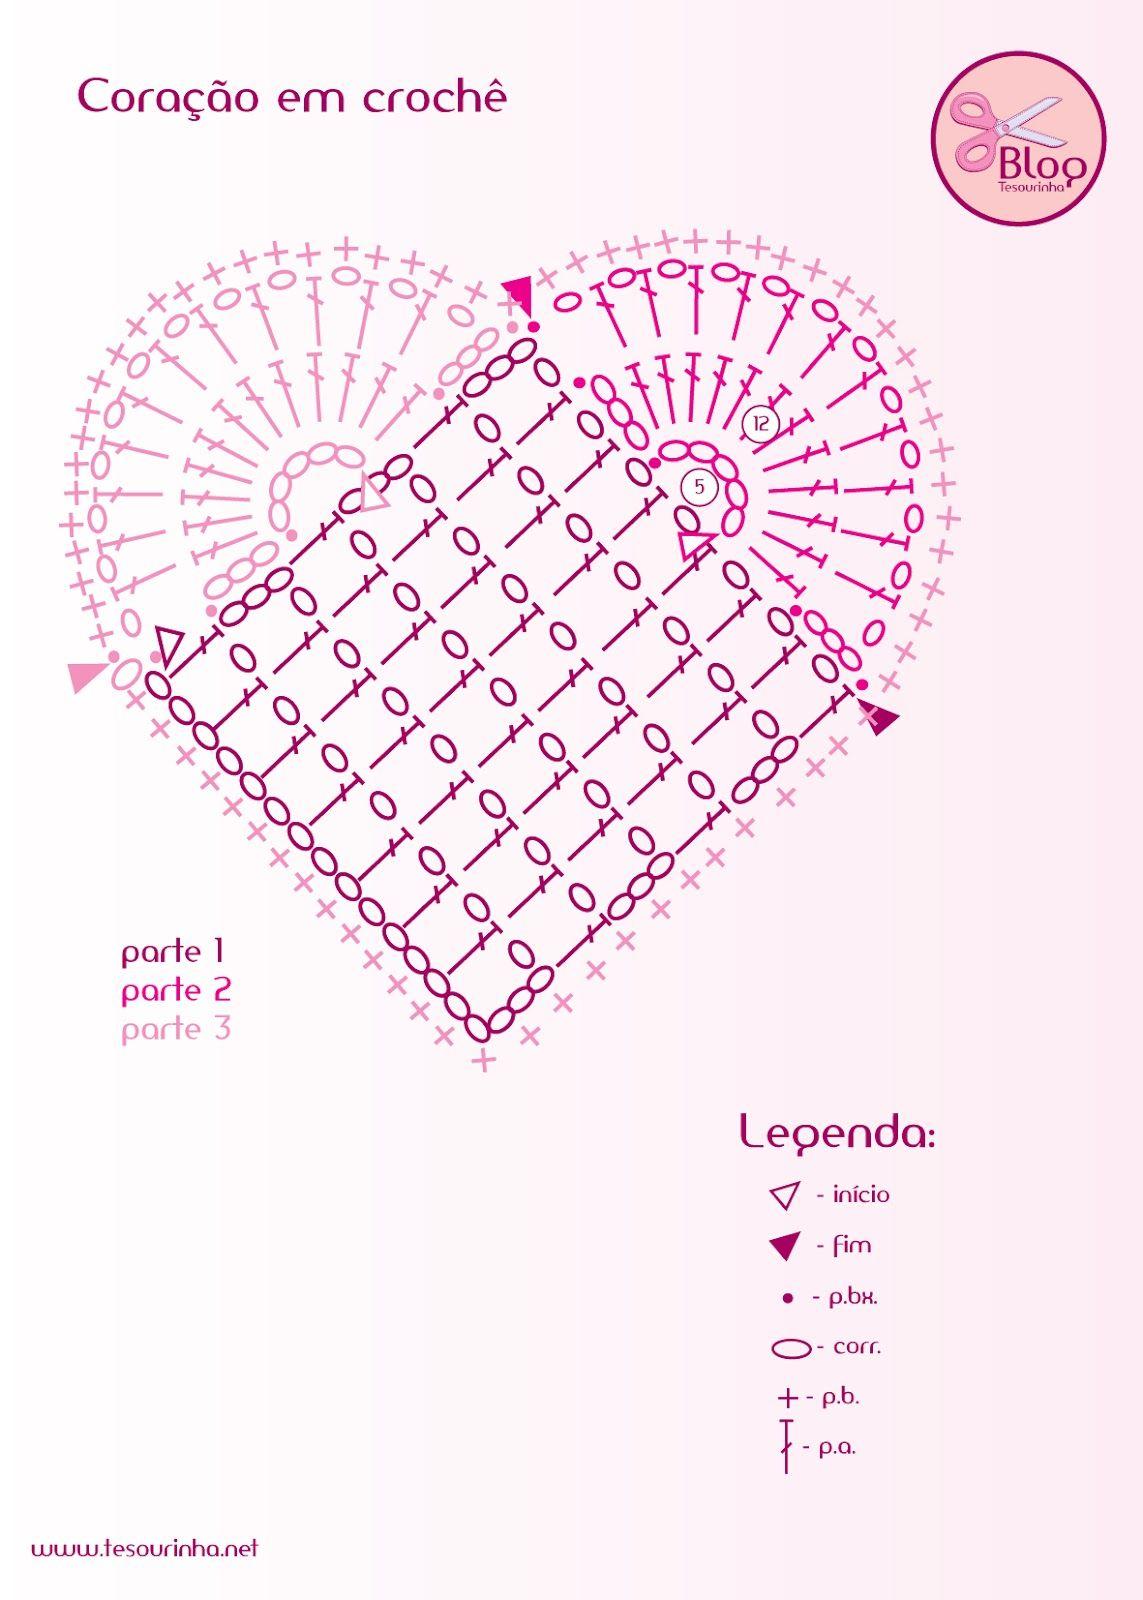 Crochet heart diagram rg poetlk ve supla modeller pinterest crochet heart diagram ccuart Images